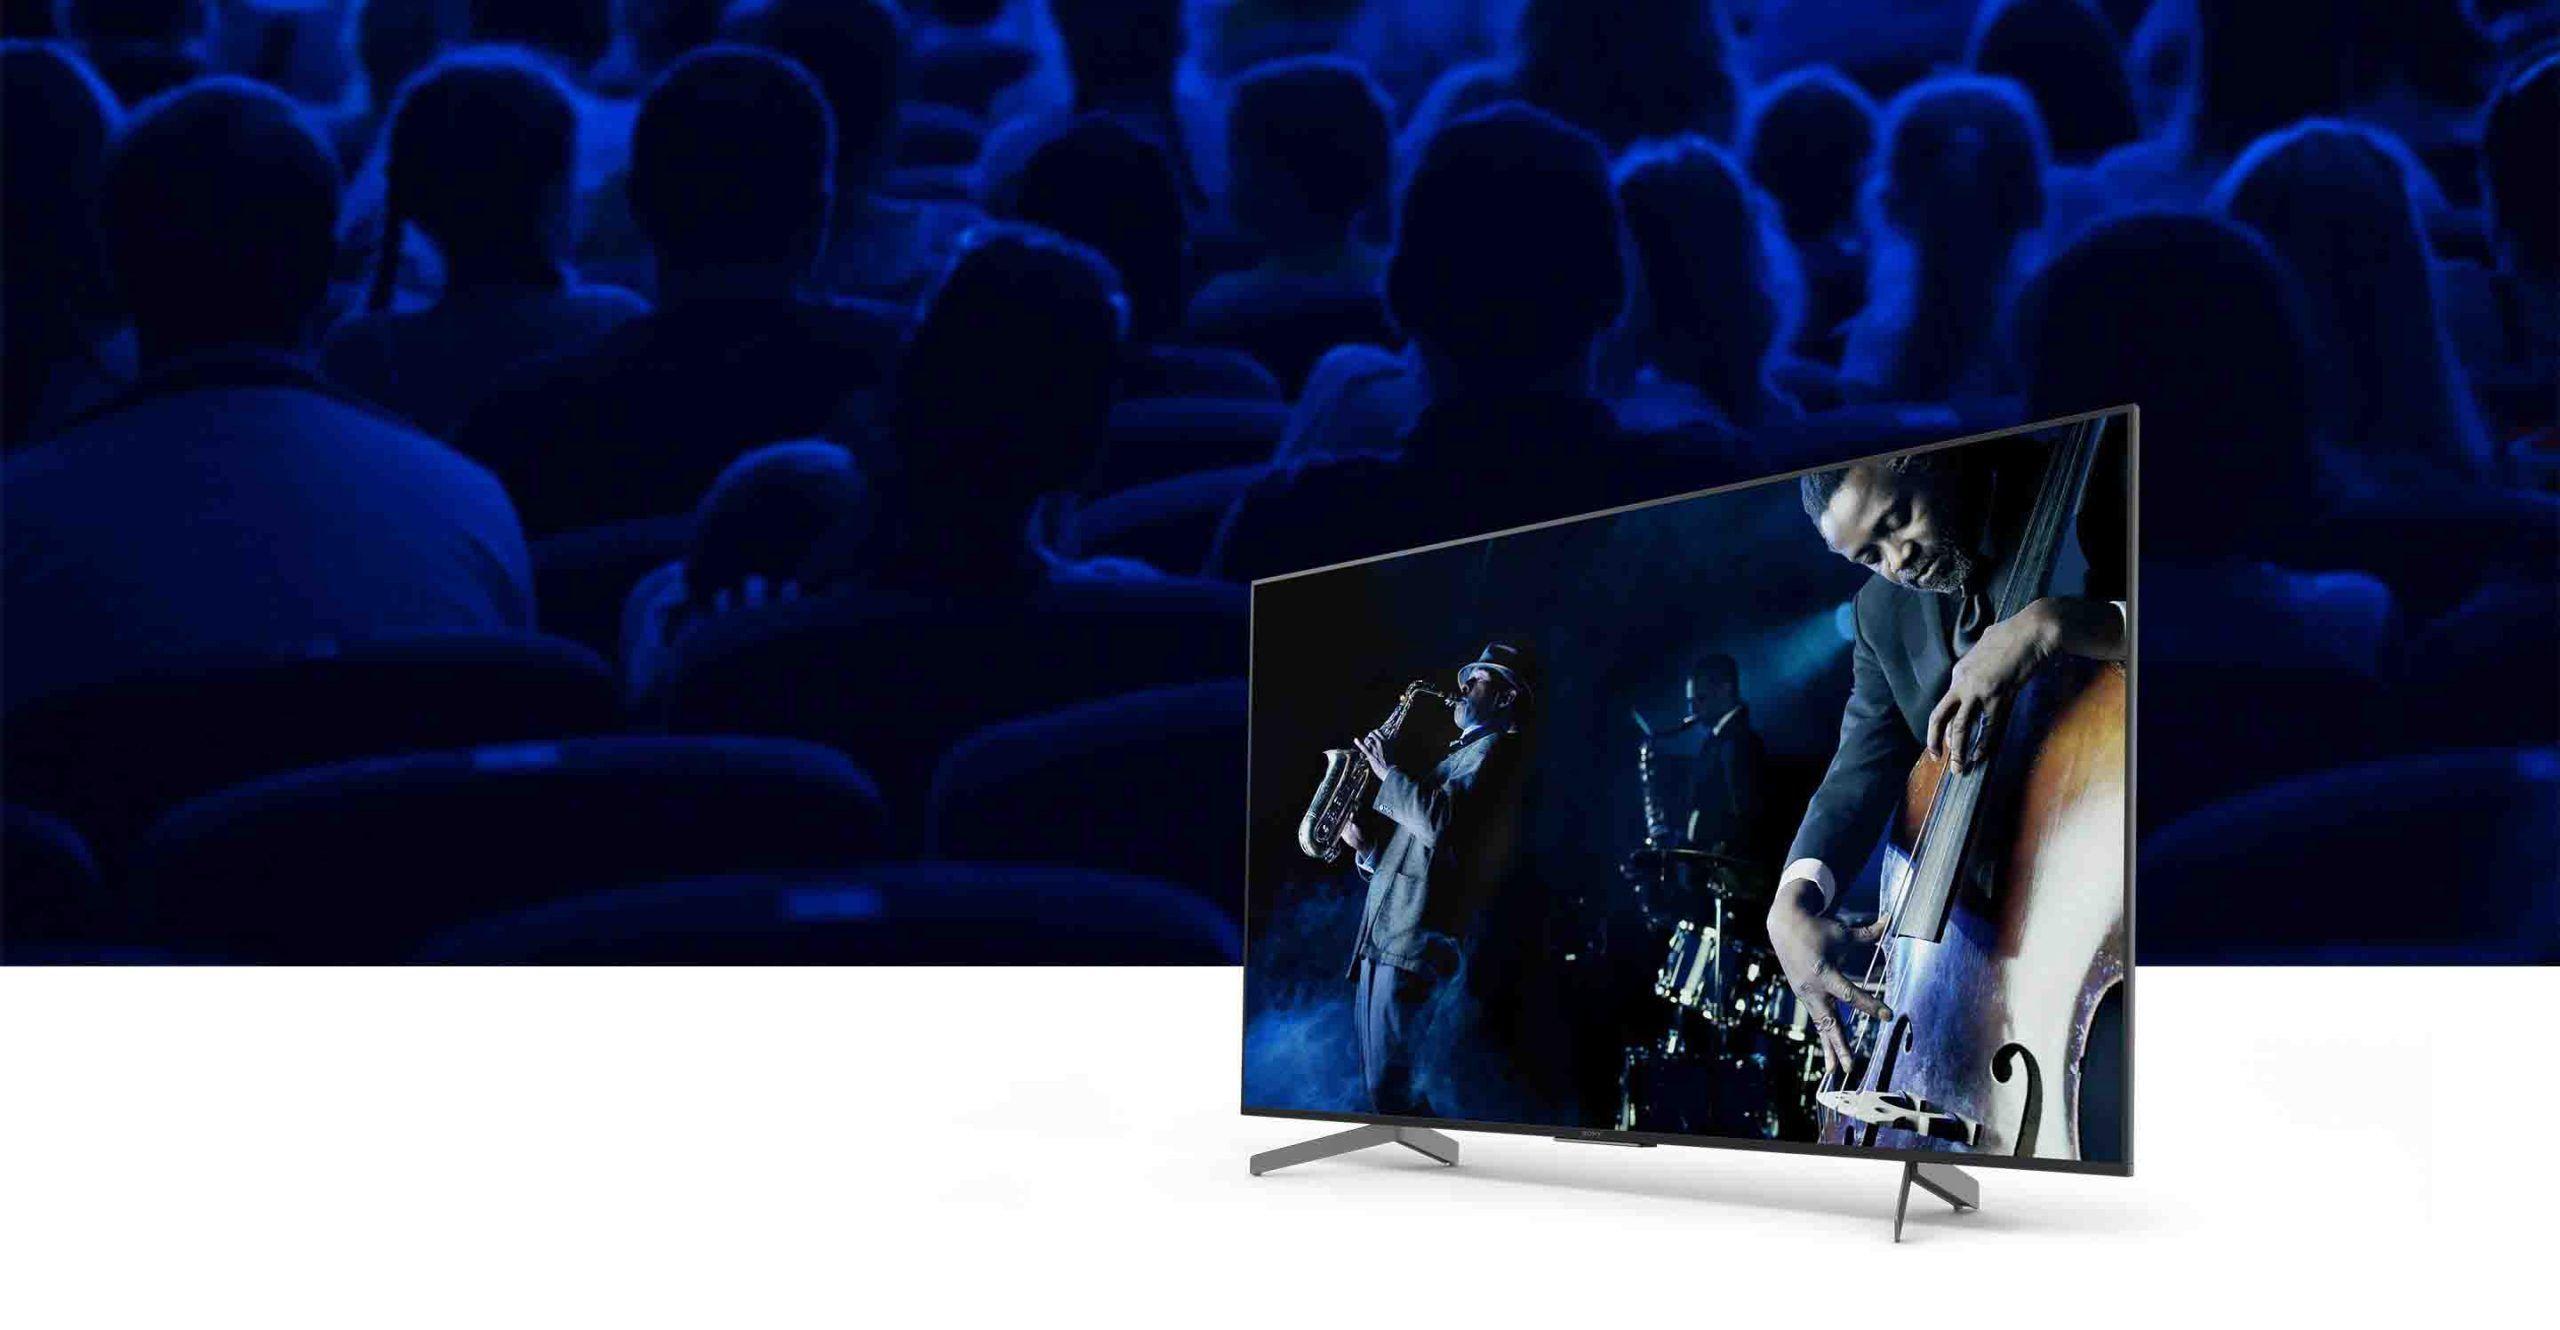 تلویزیون55 اینچ سونی مدل SONY LED 55X8500G